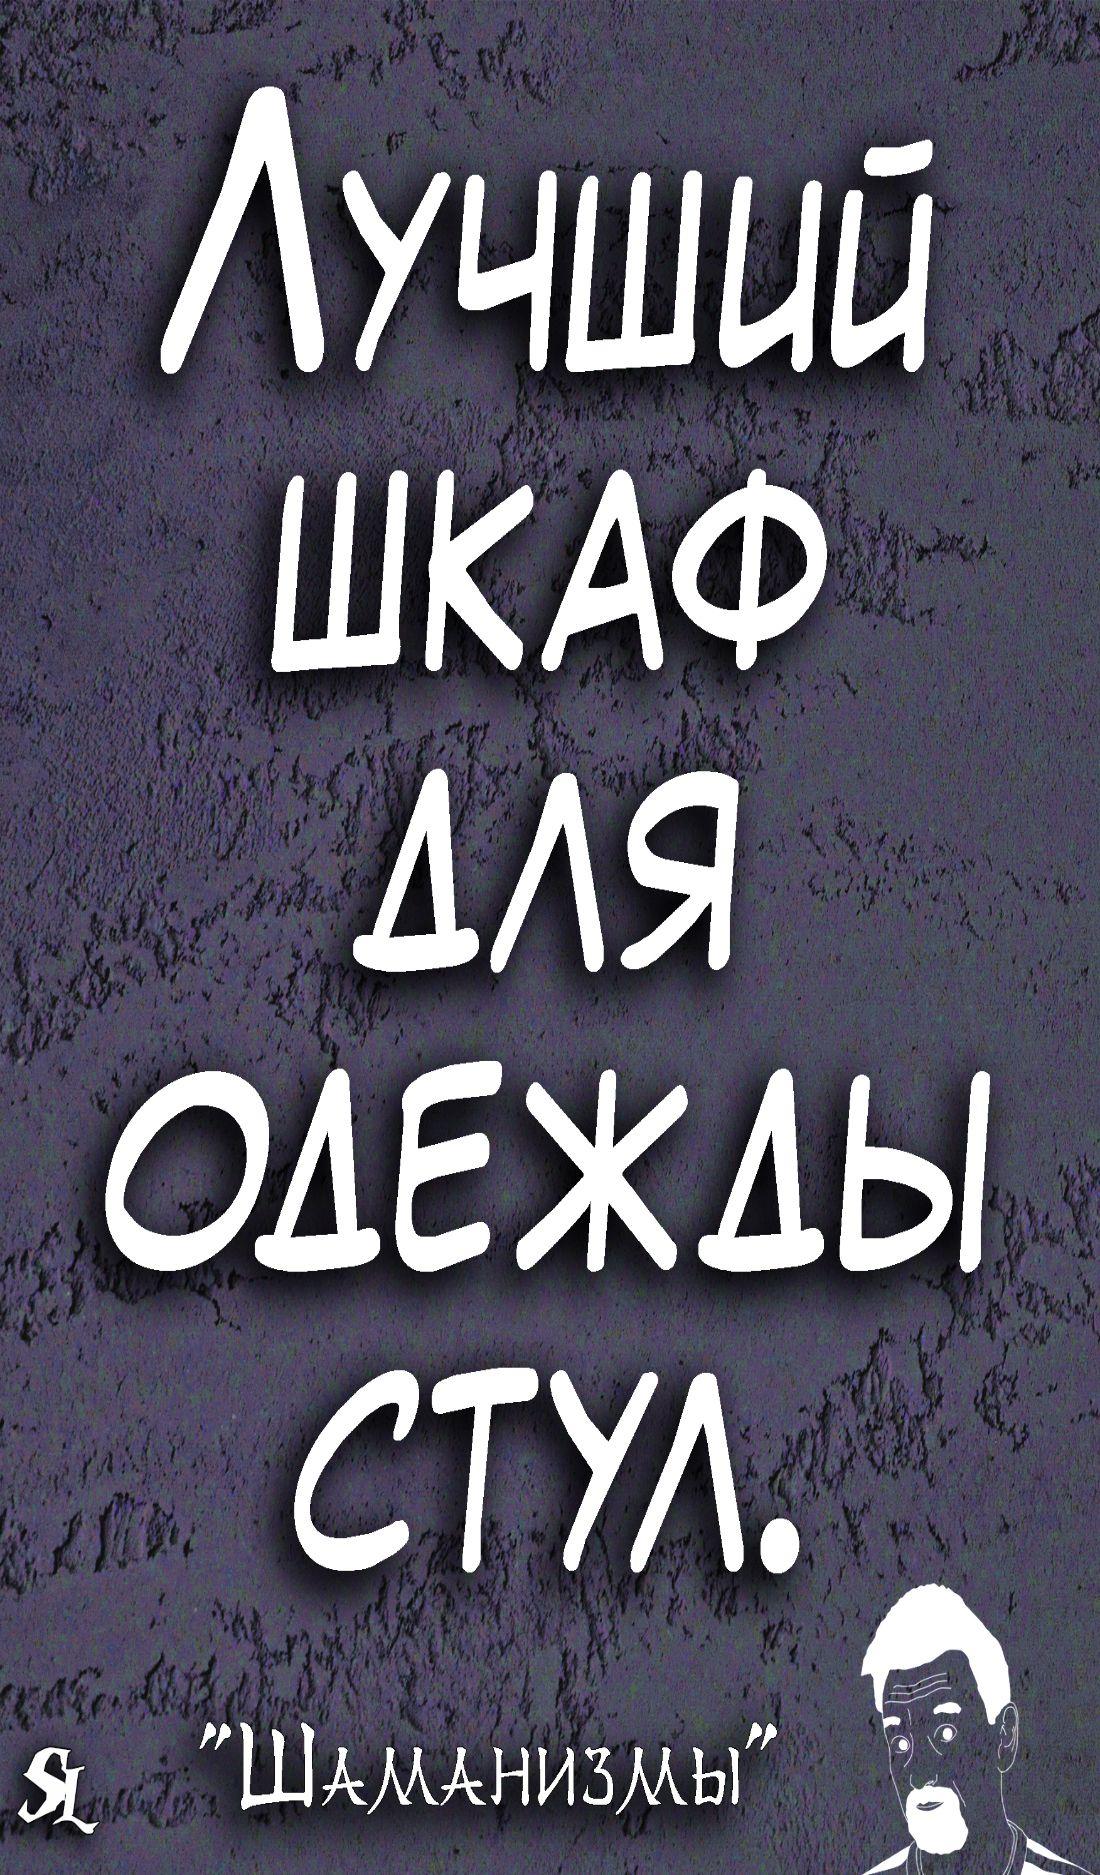 Shamanizmy Shutki Prikol Yumor Jokes Funny Humor Memes Shaman Ledentsov Sl Shaman Ledentsov Phrase Of The Day Jokes Quotations